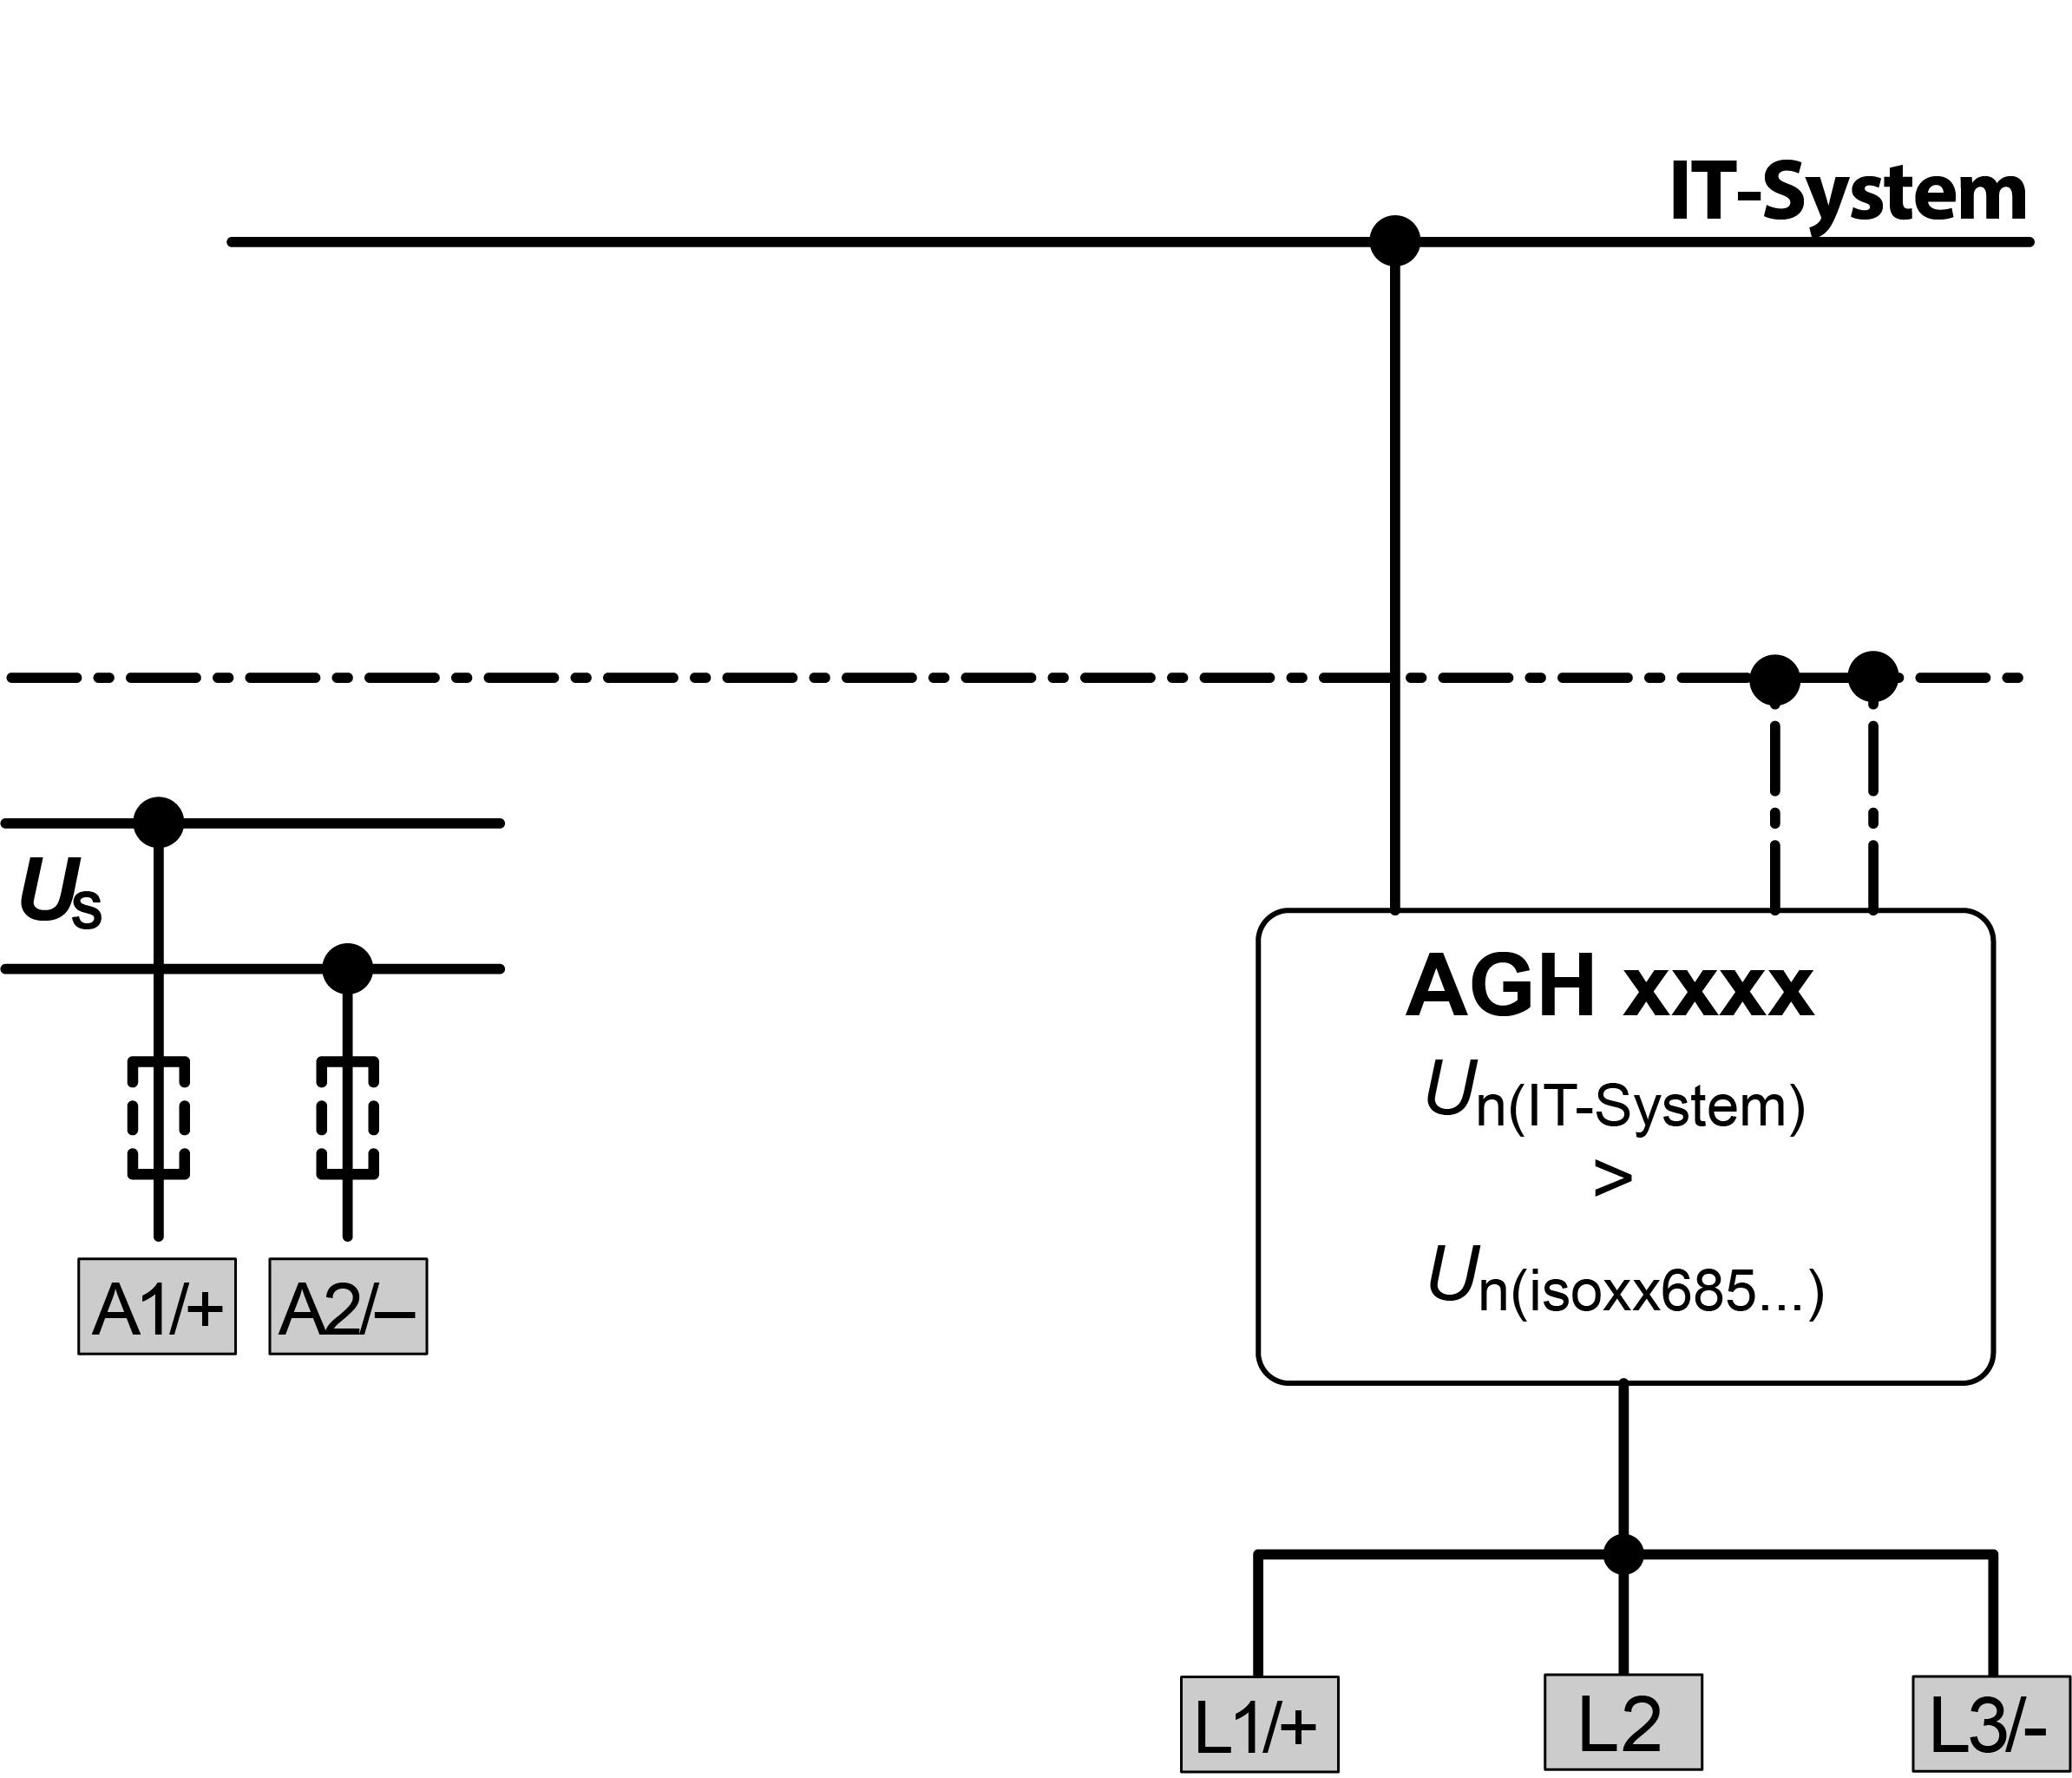 [Translate to english:] Bender UK technology enhances subsea cable monitoring capabilities